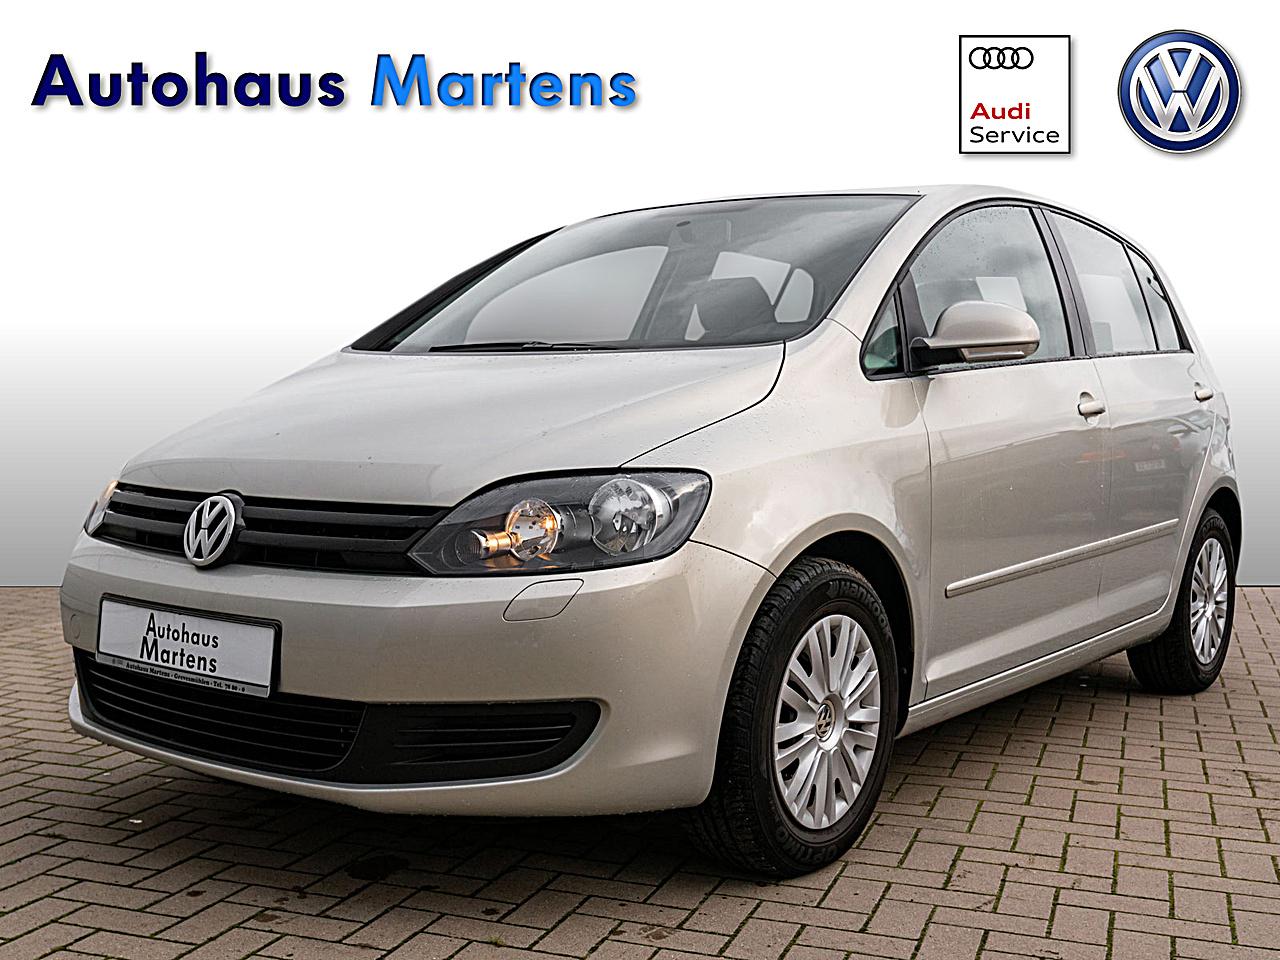 Volkswagen Golf VI Plus 1.2 TSI Trendline Klima, Jahr 2012, petrol